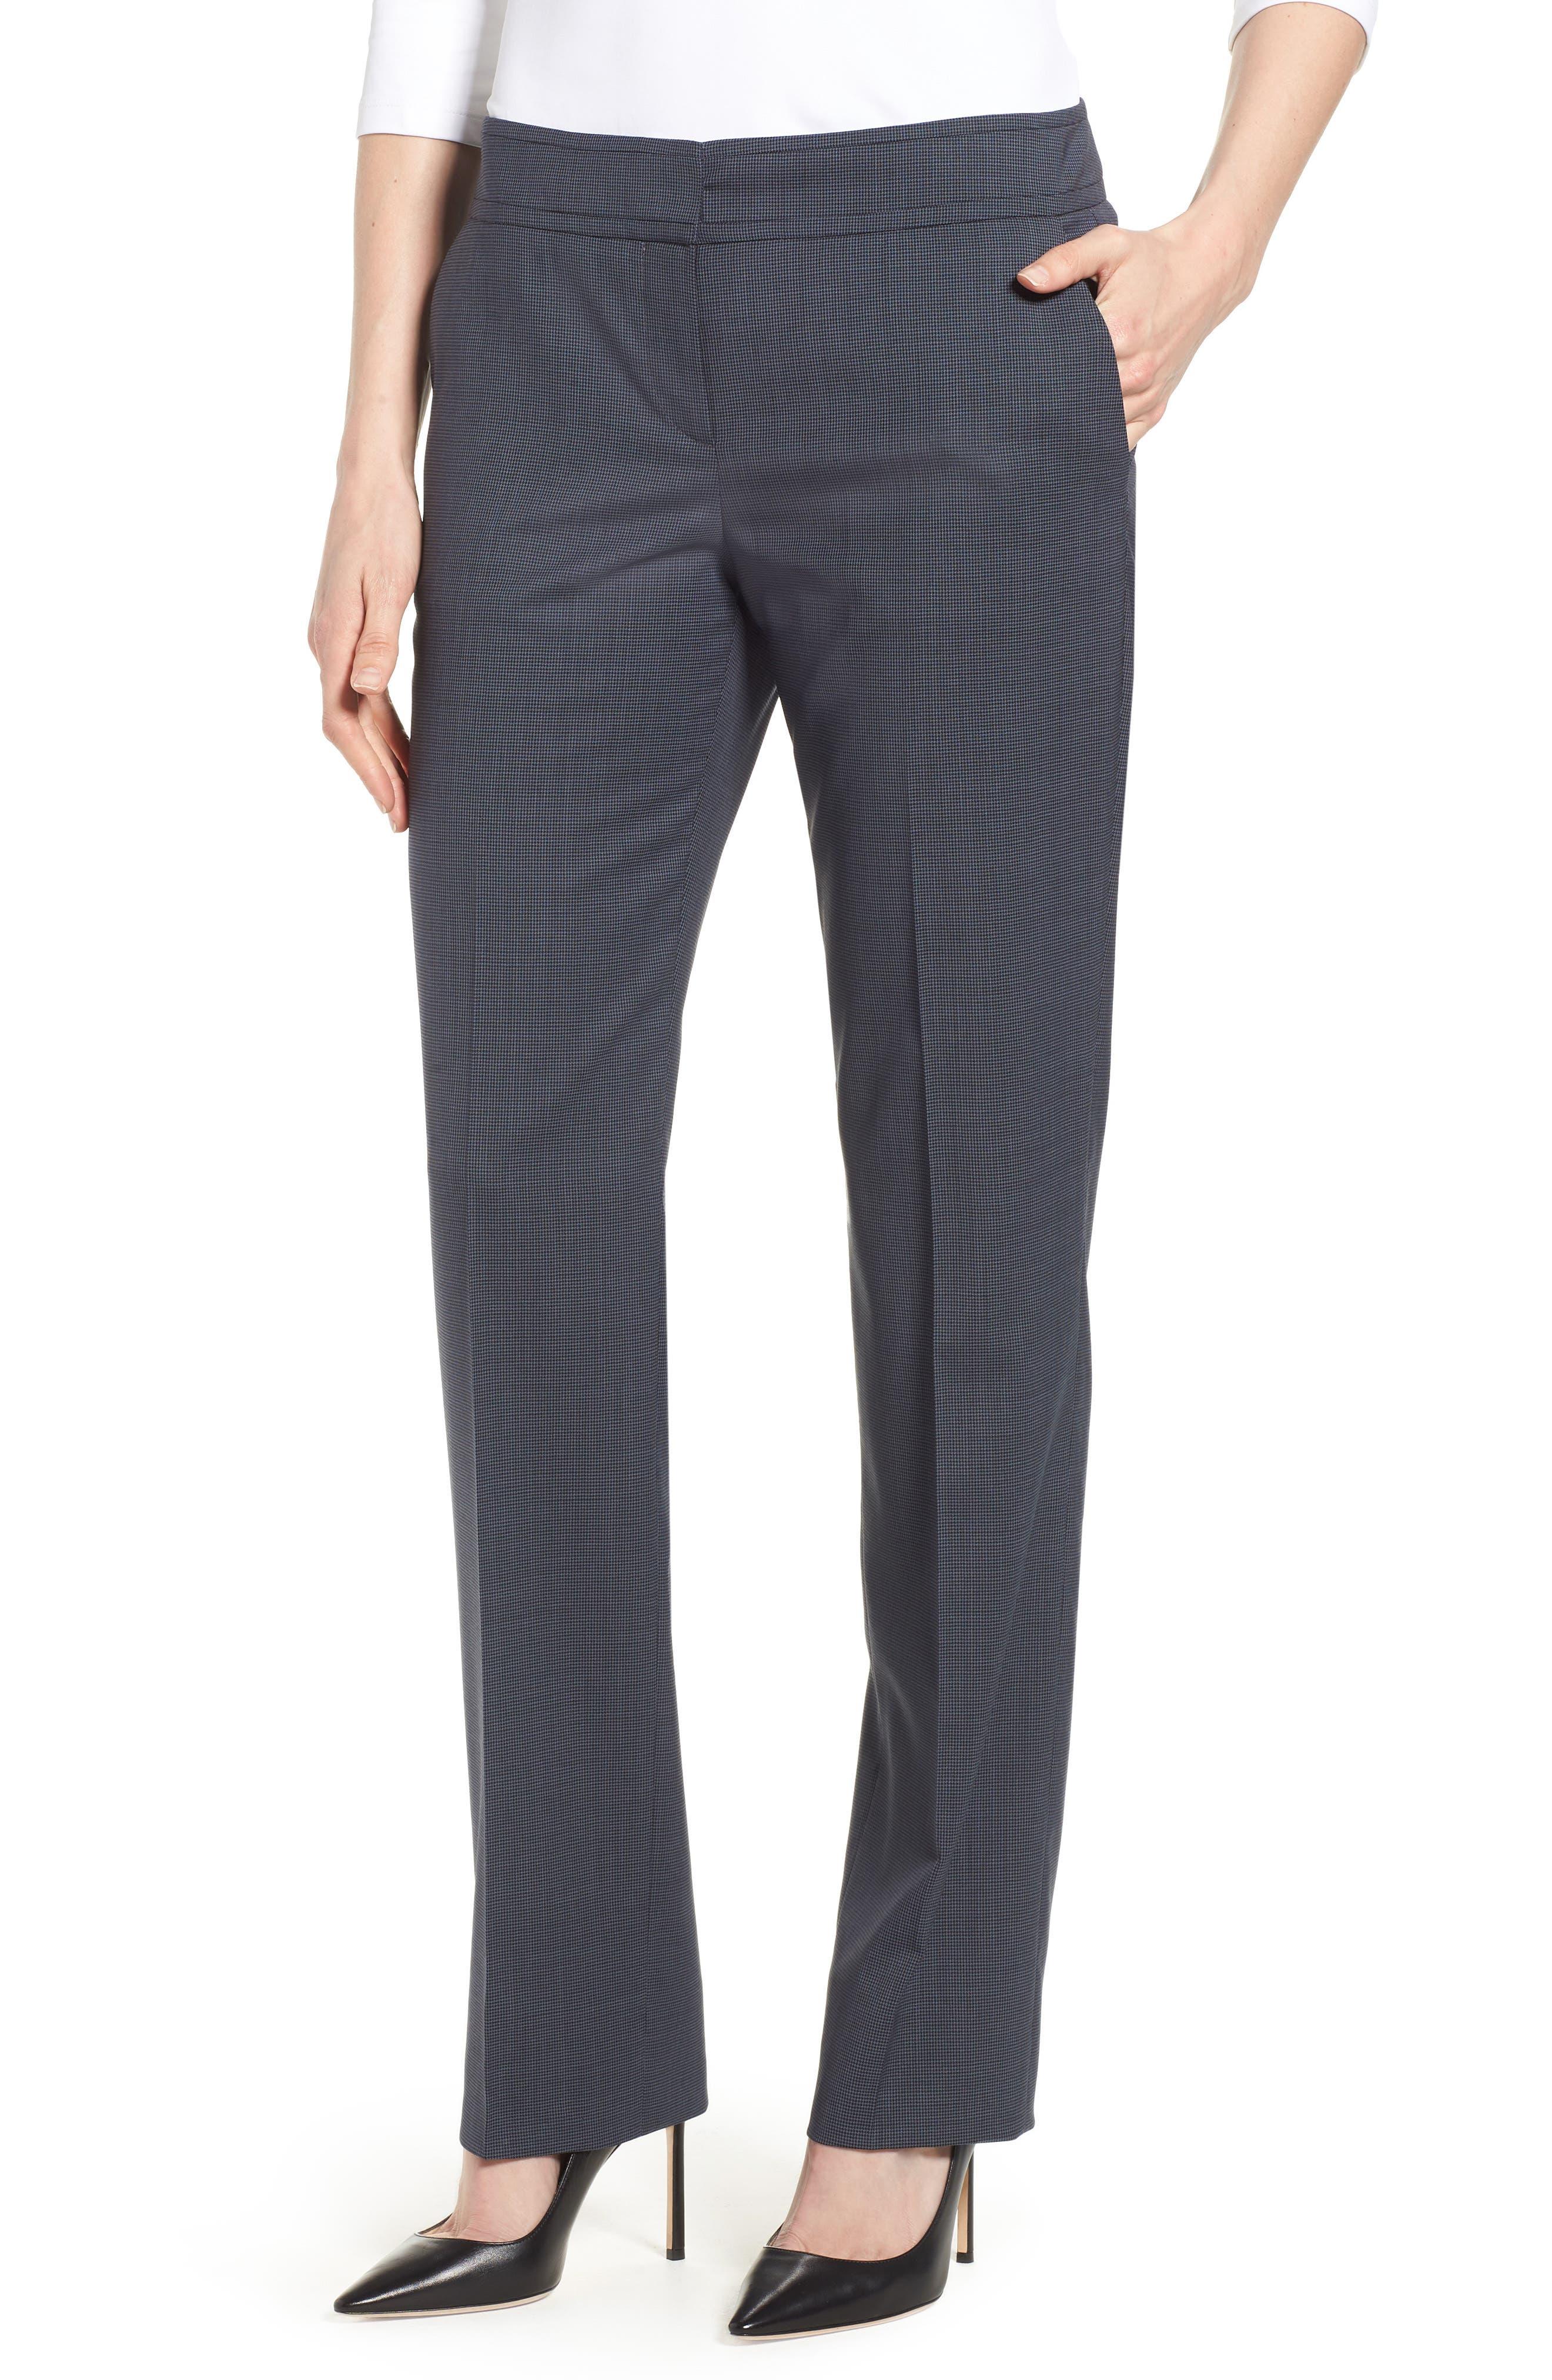 Talouise Pepita Stretch Wool Suit Pants,                         Main,                         color, Nautic Blue Fantasy